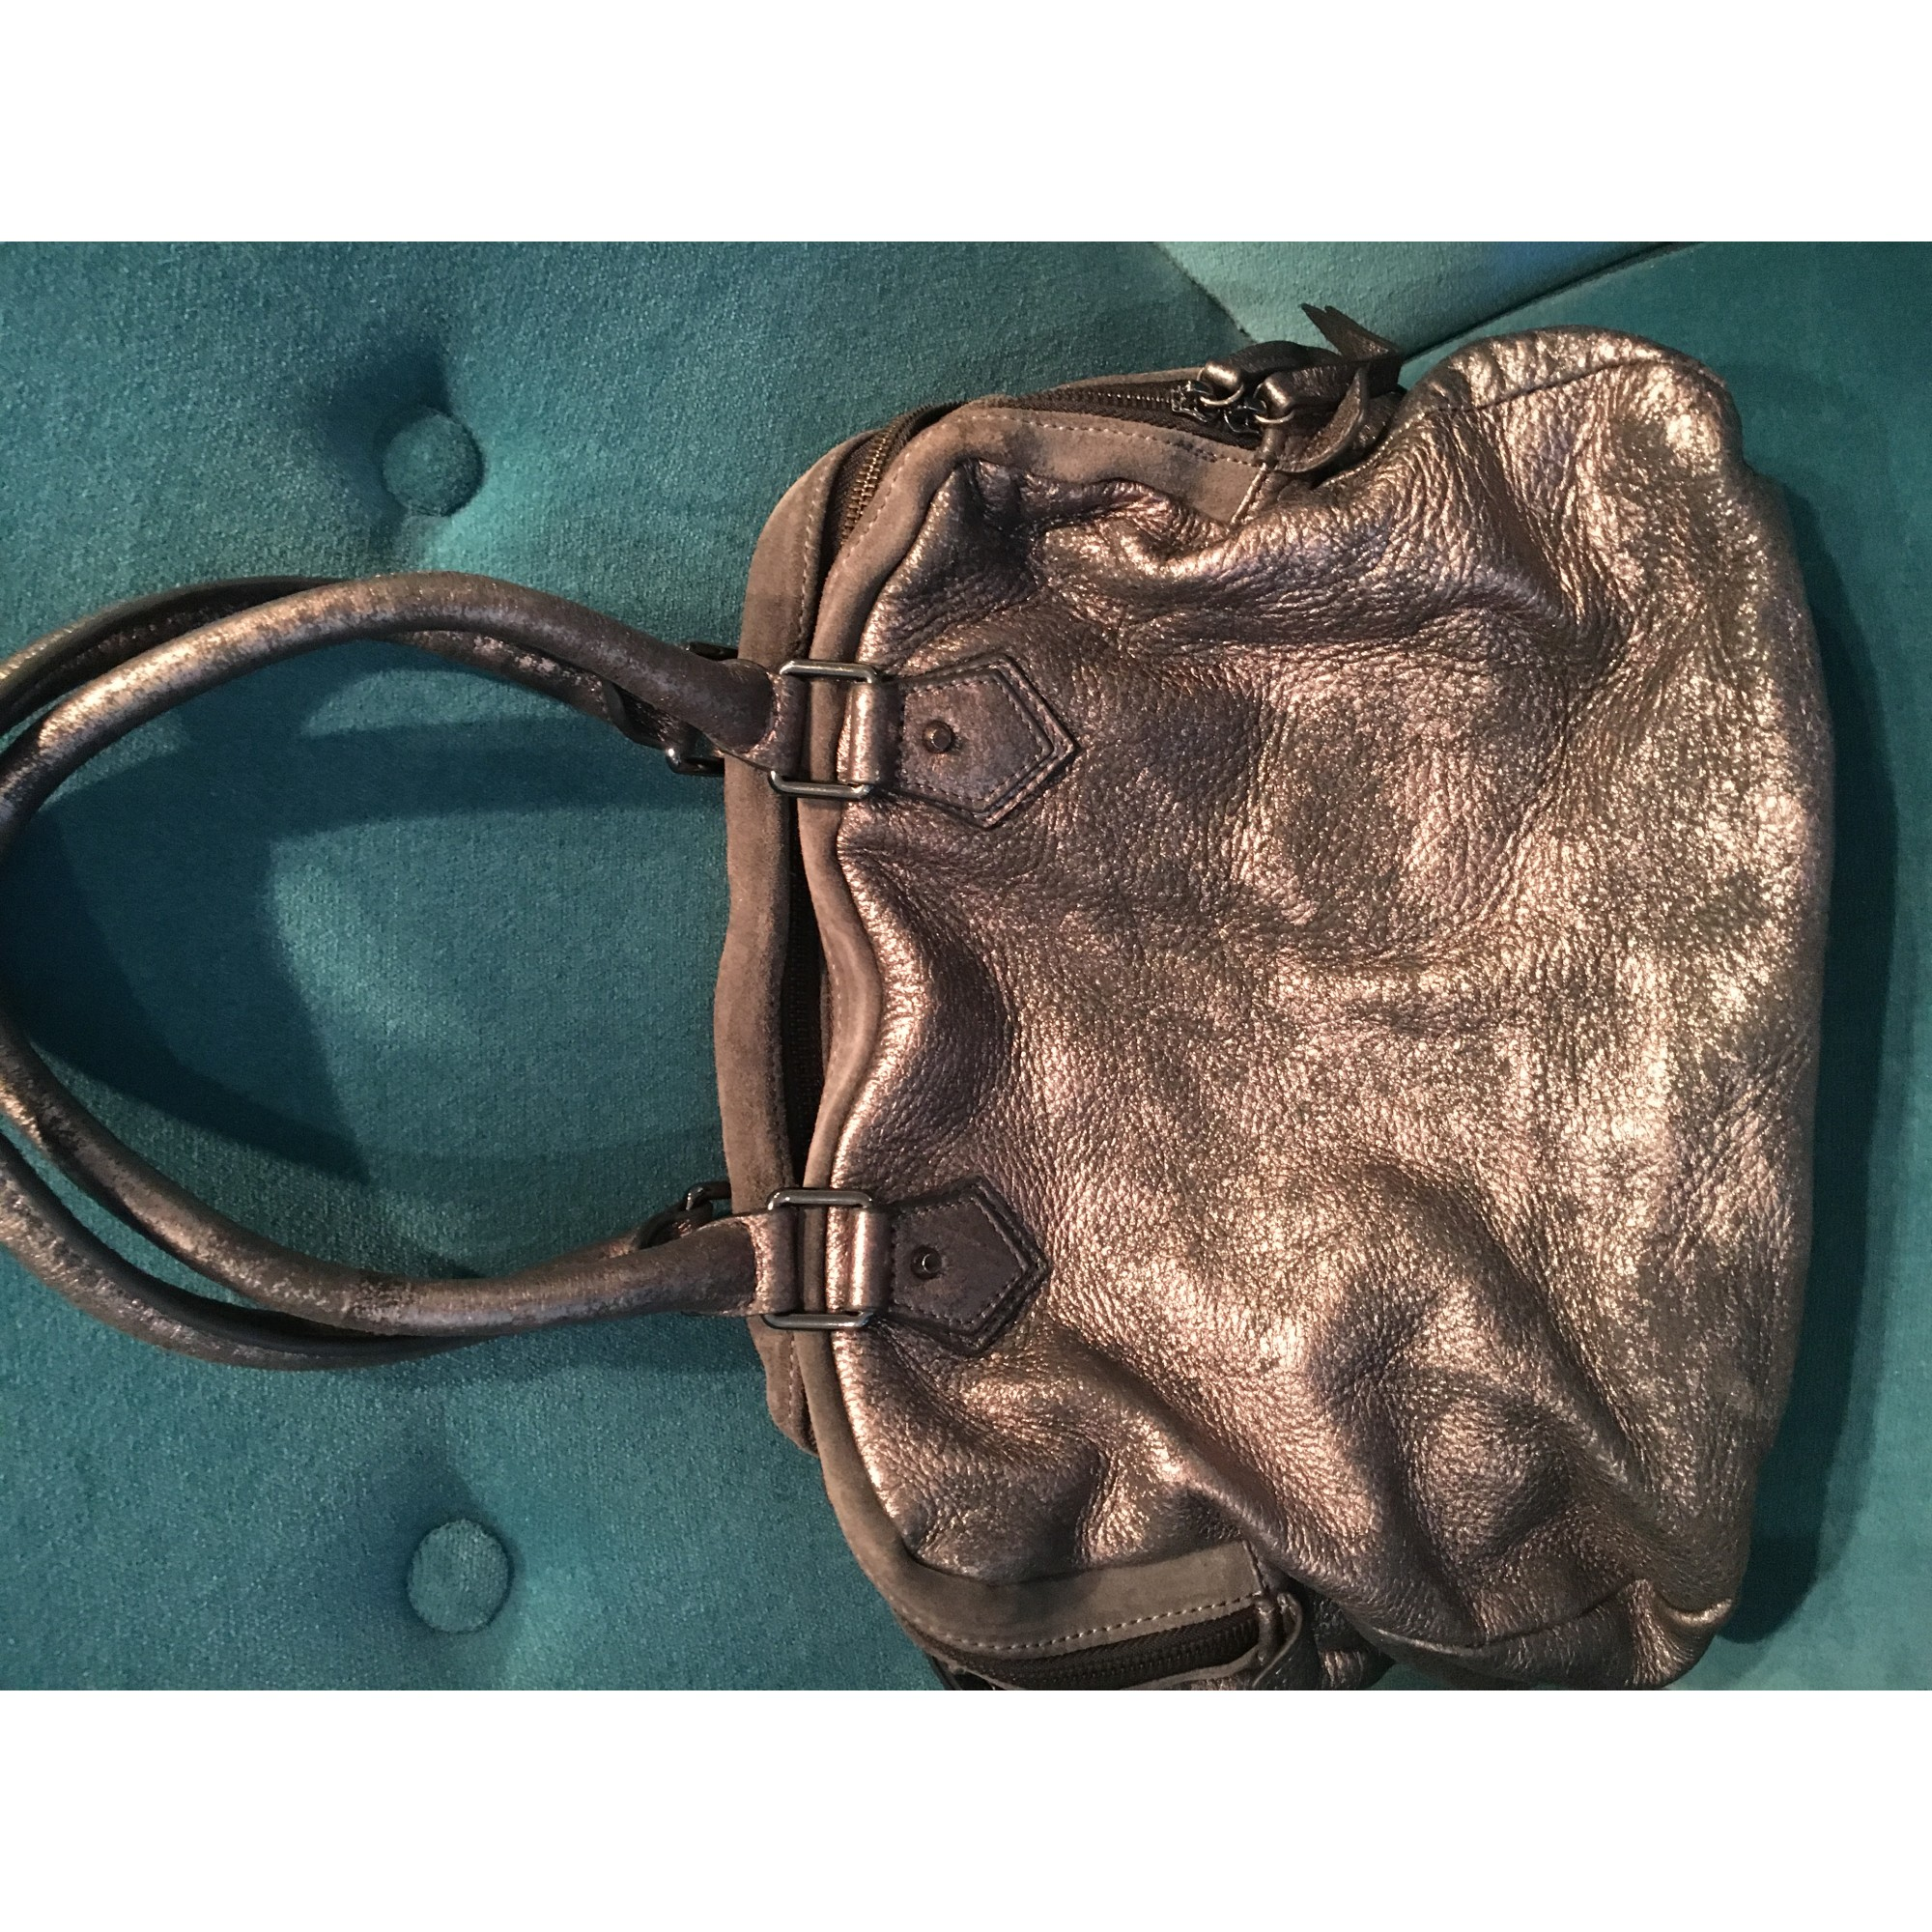 Sac à main en cuir CAROLL gris vendu par Le dressing de karine - 6692480 f4d32bf1840